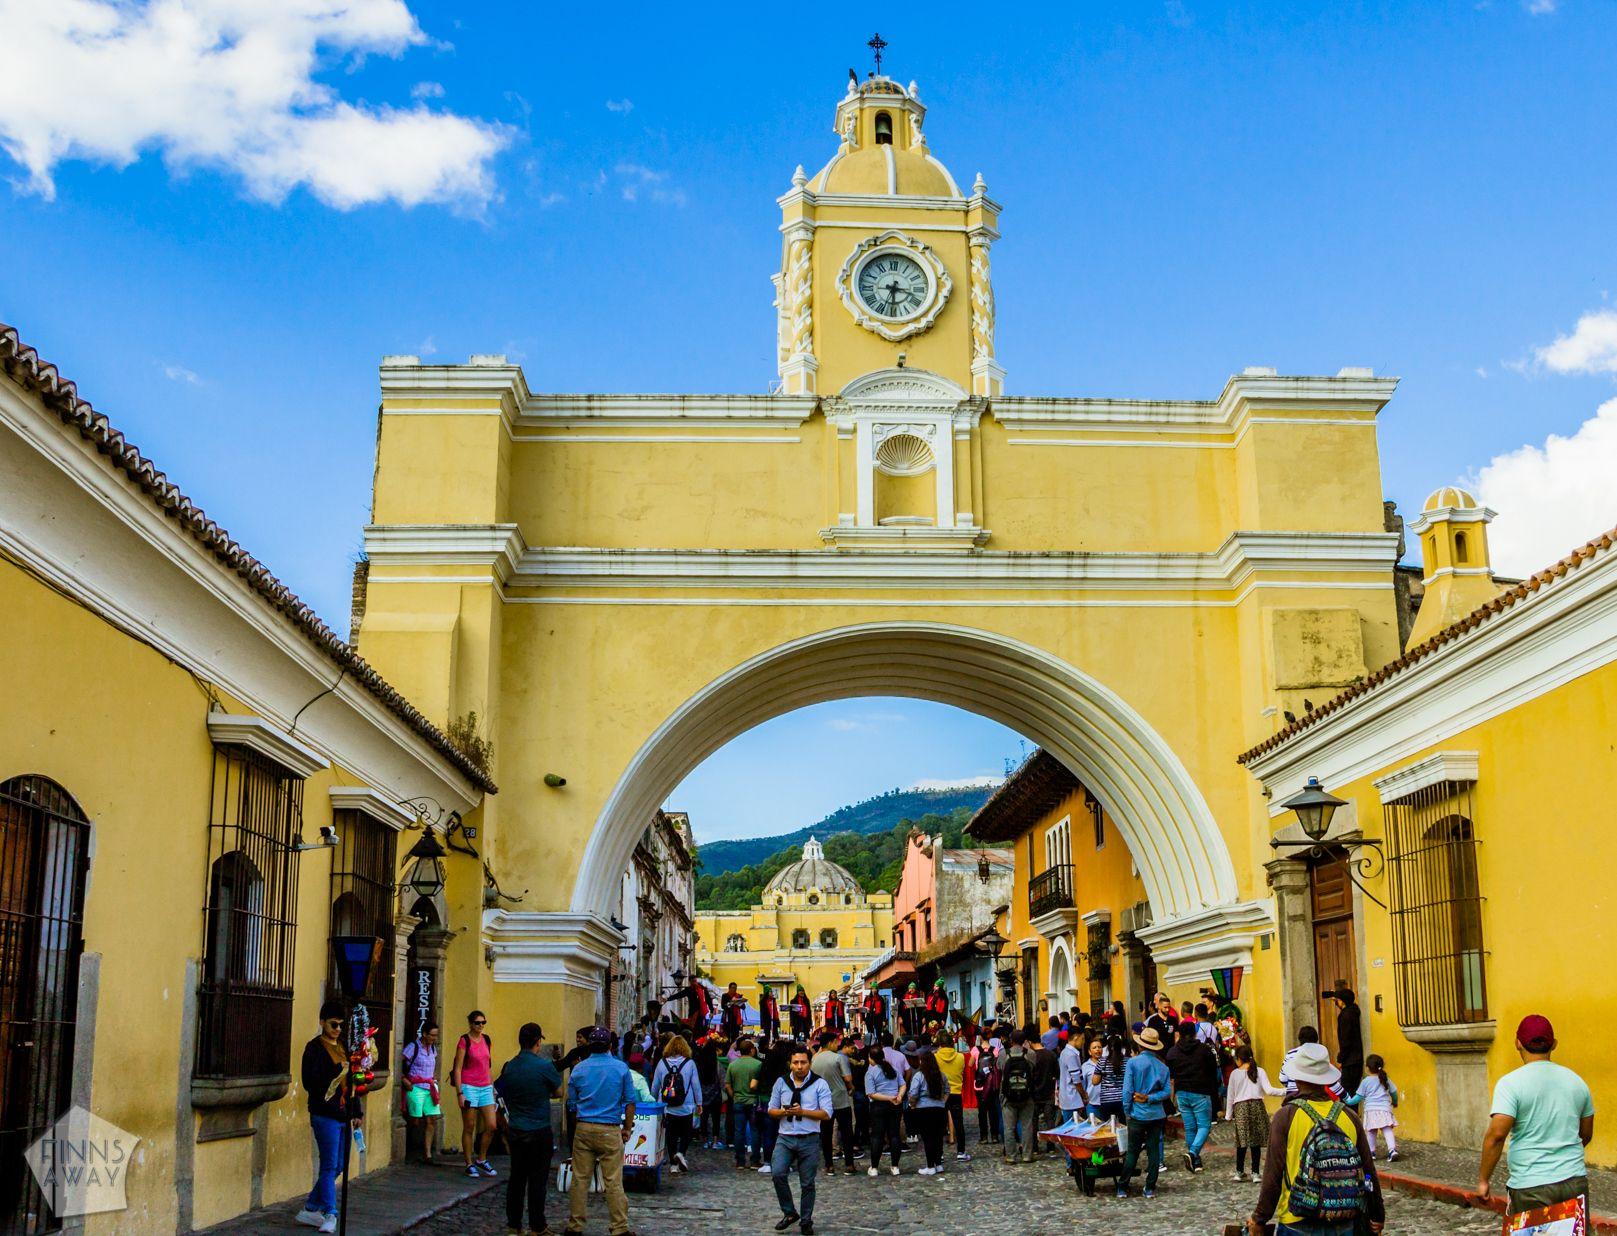 Santa Catalina Arch   Introduction to historical Antigua Guatemala   FinnsAway Travel Blog